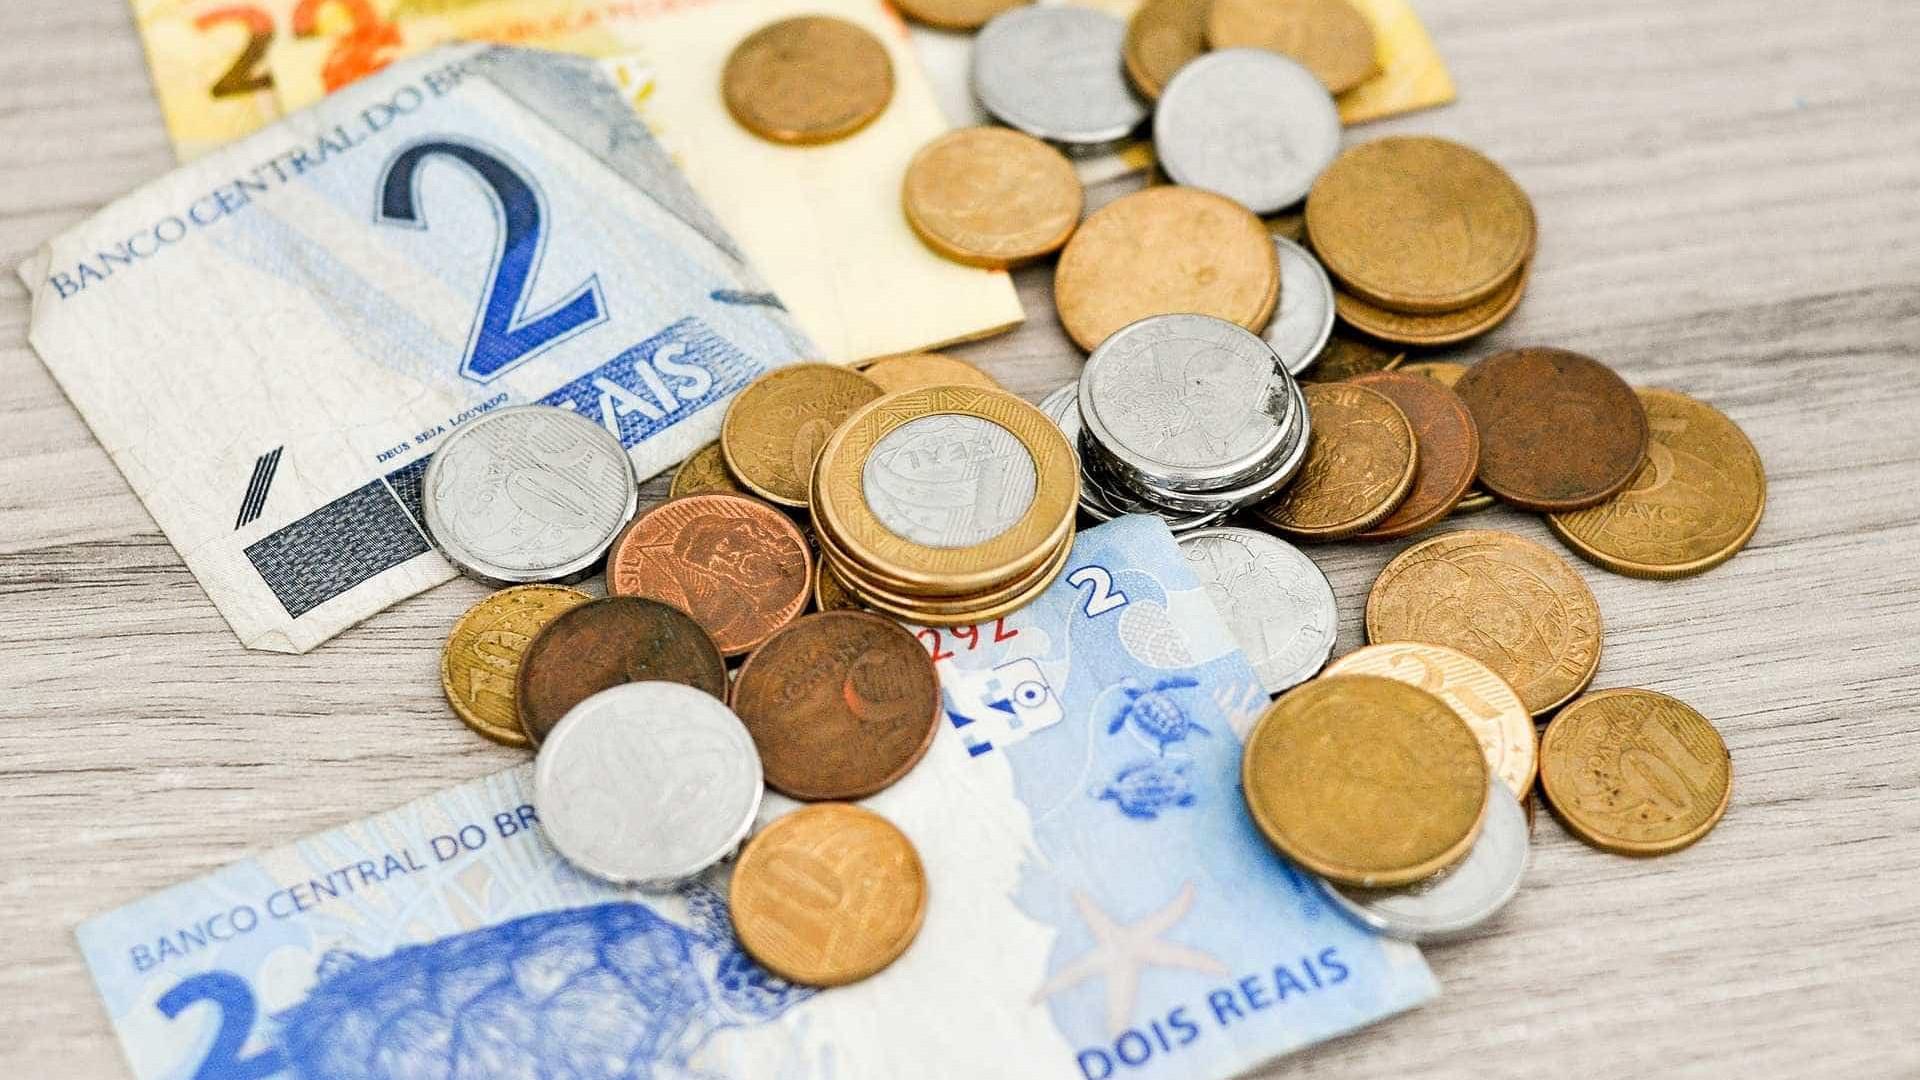 Mesmo na lista suja, Odebrecht recebeu R$ 5 bi por contratos antigos